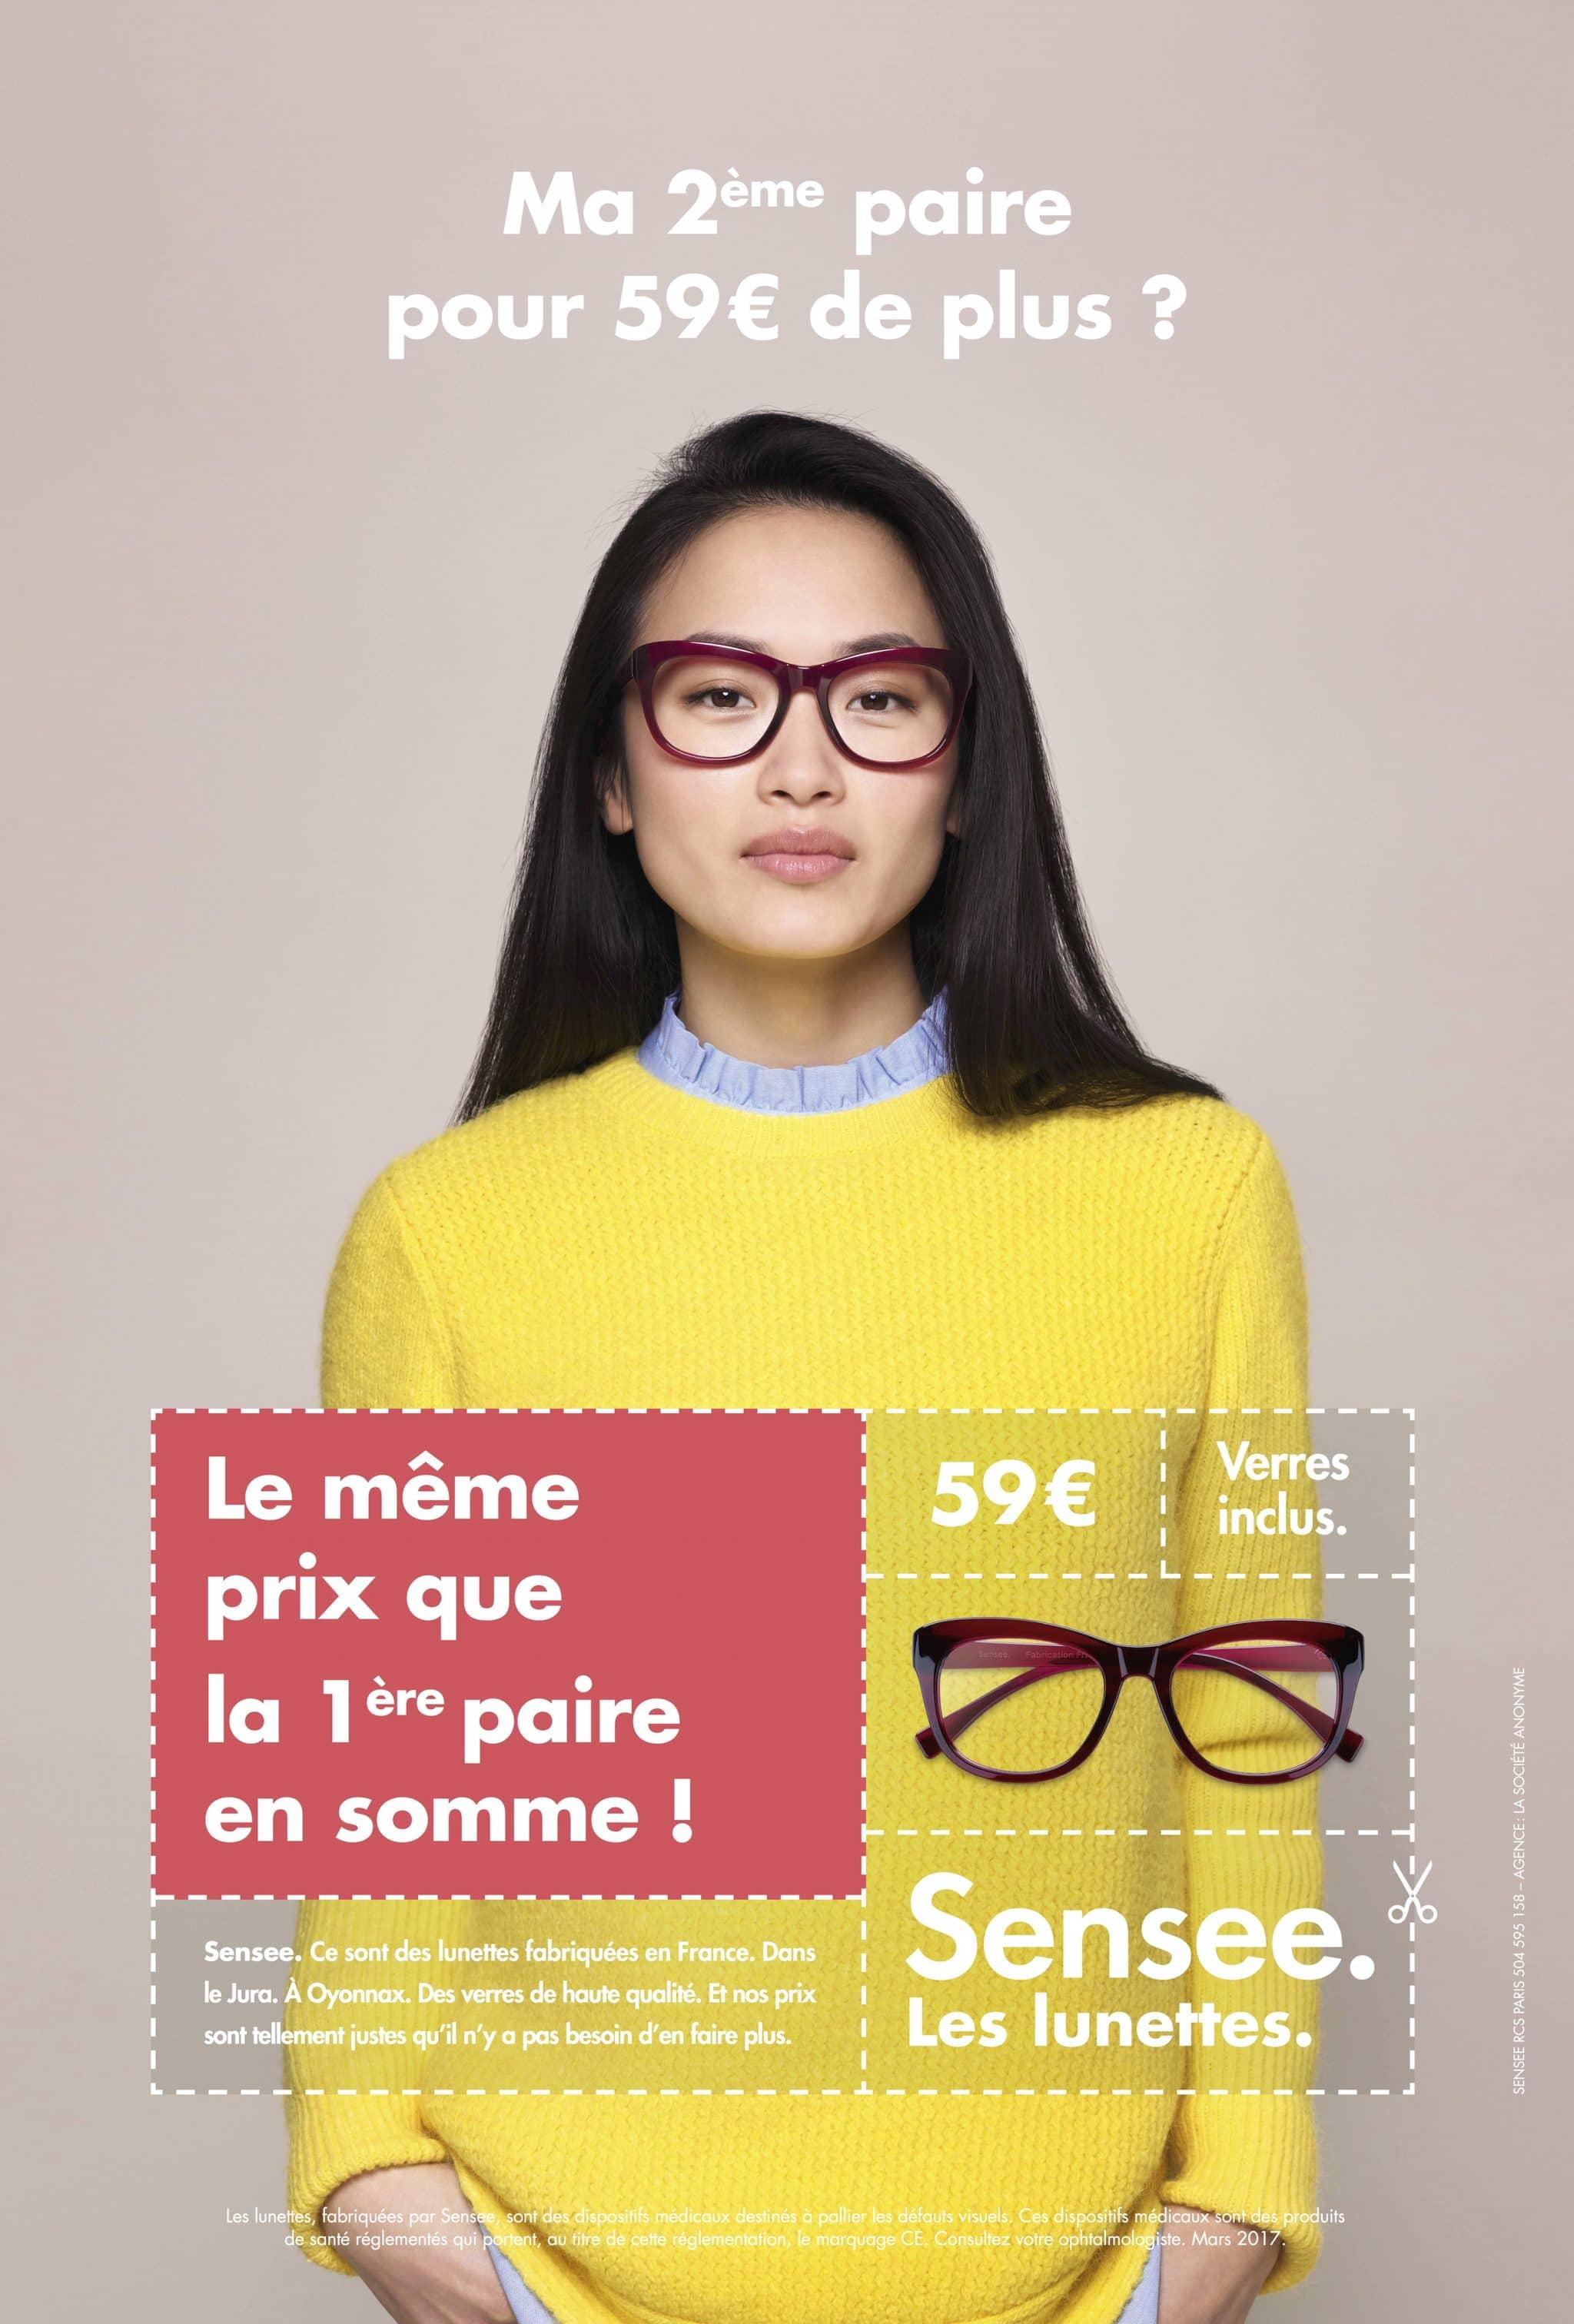 https://www.marques-de-france.fr/wp-content/uploads/2019/04/Sensee_pub-4.jpg